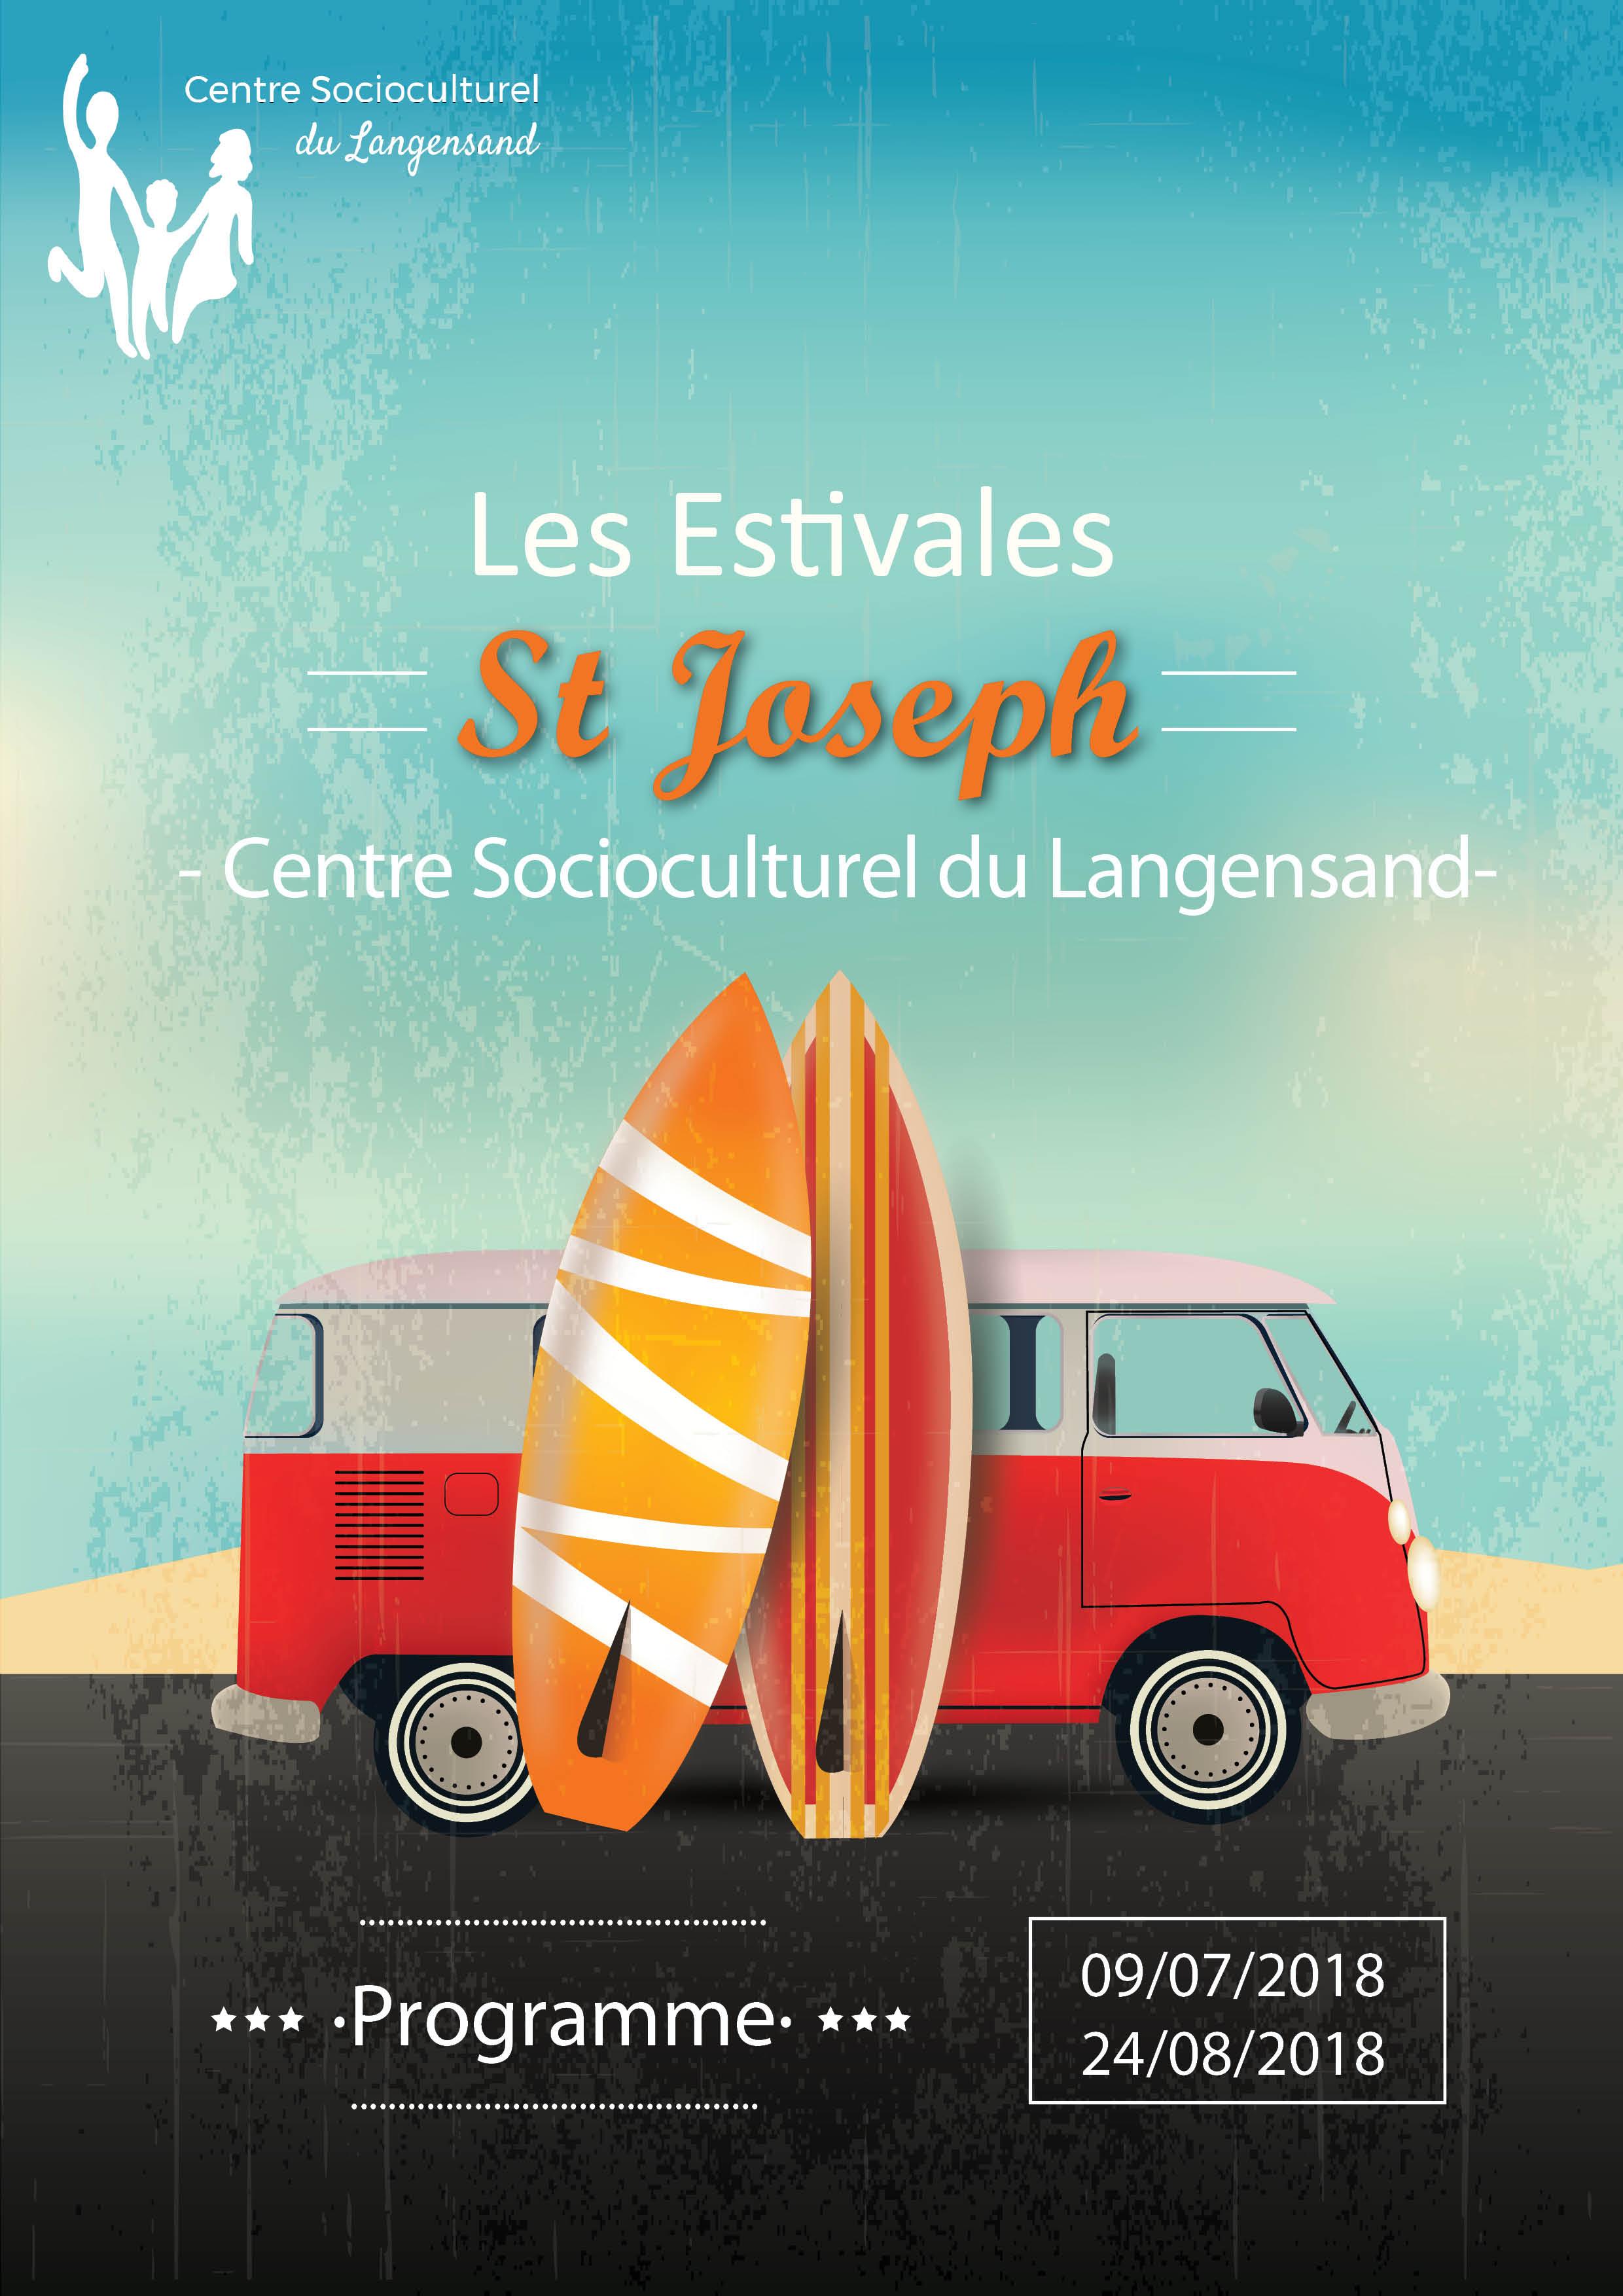 Les Estivales ST Joseph 2018